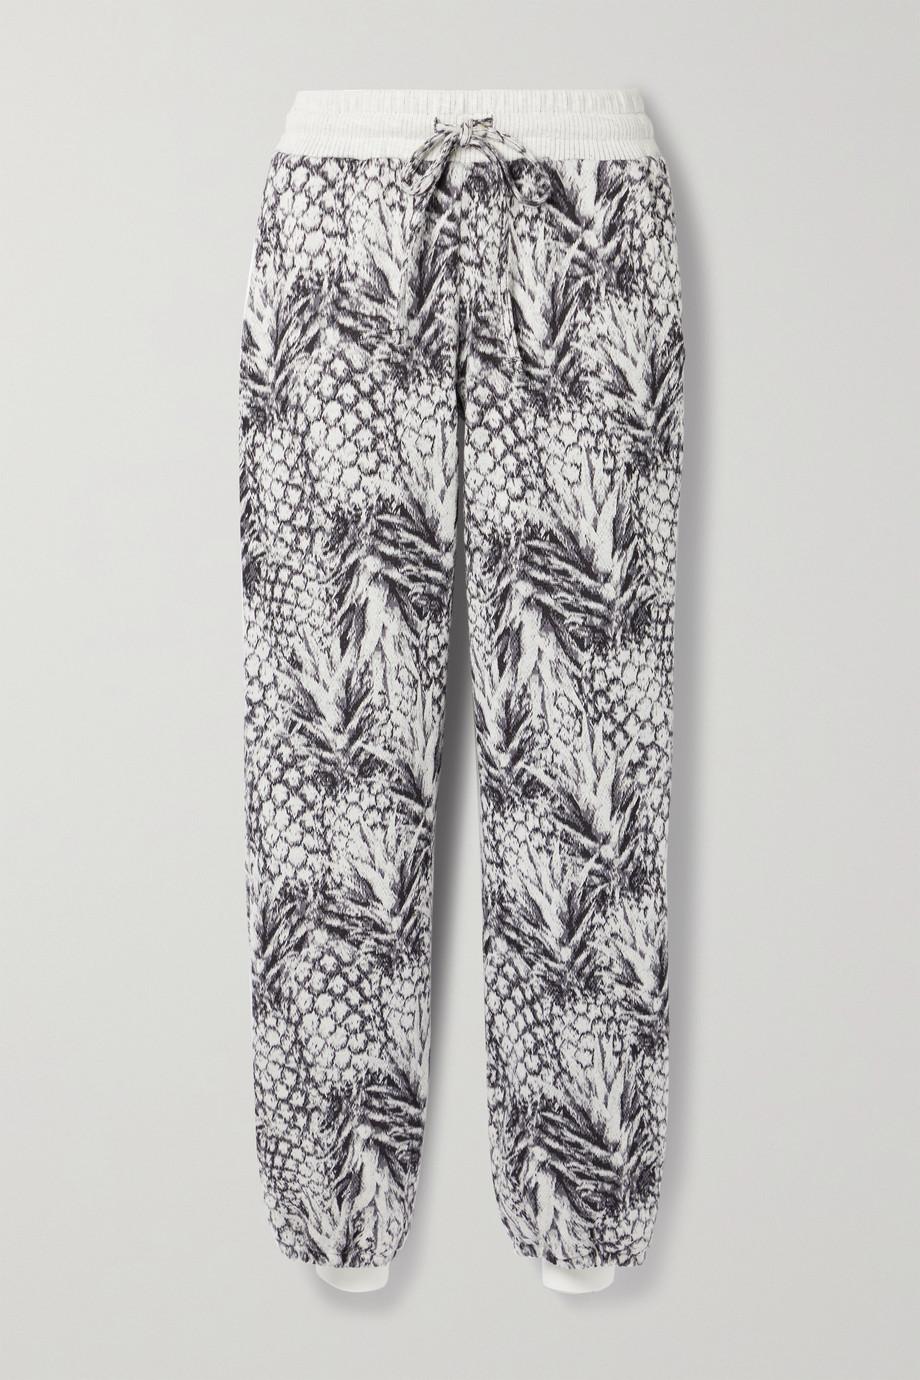 TWENTY Montréal Pineapple Hyper Reality jacquard-knit cotton-blend track pants